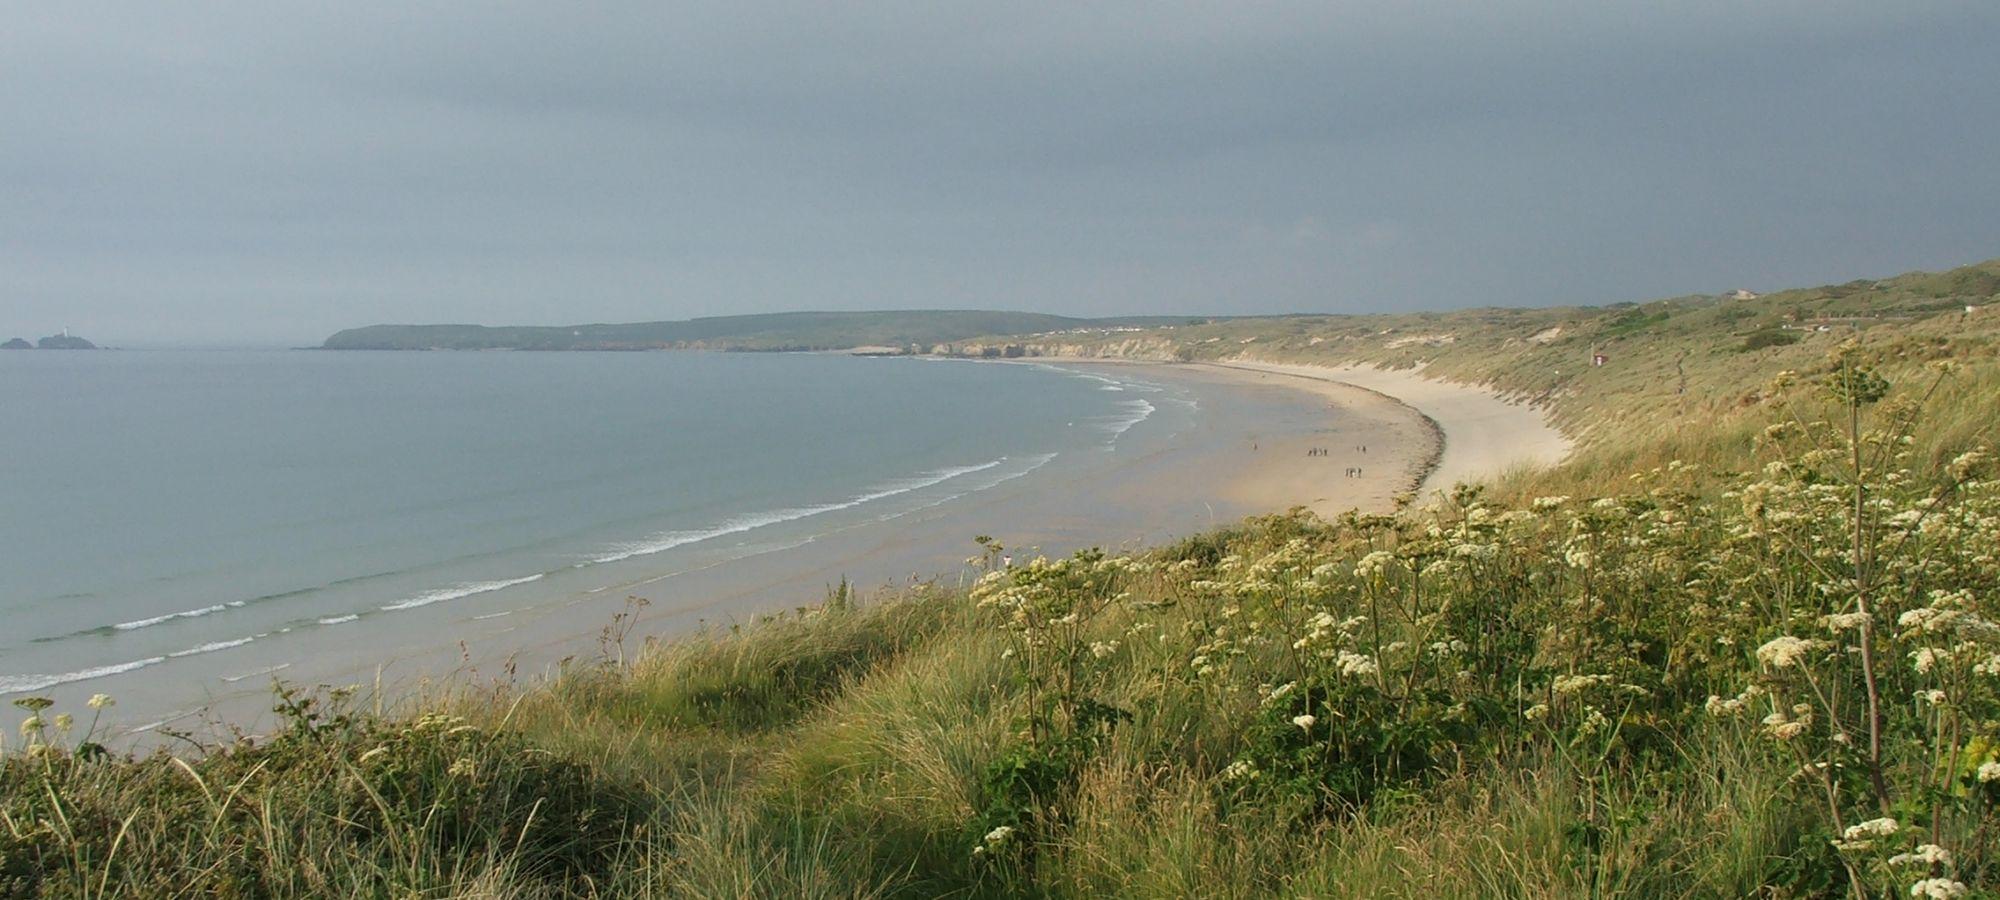 Sand dunes and beach, north coast